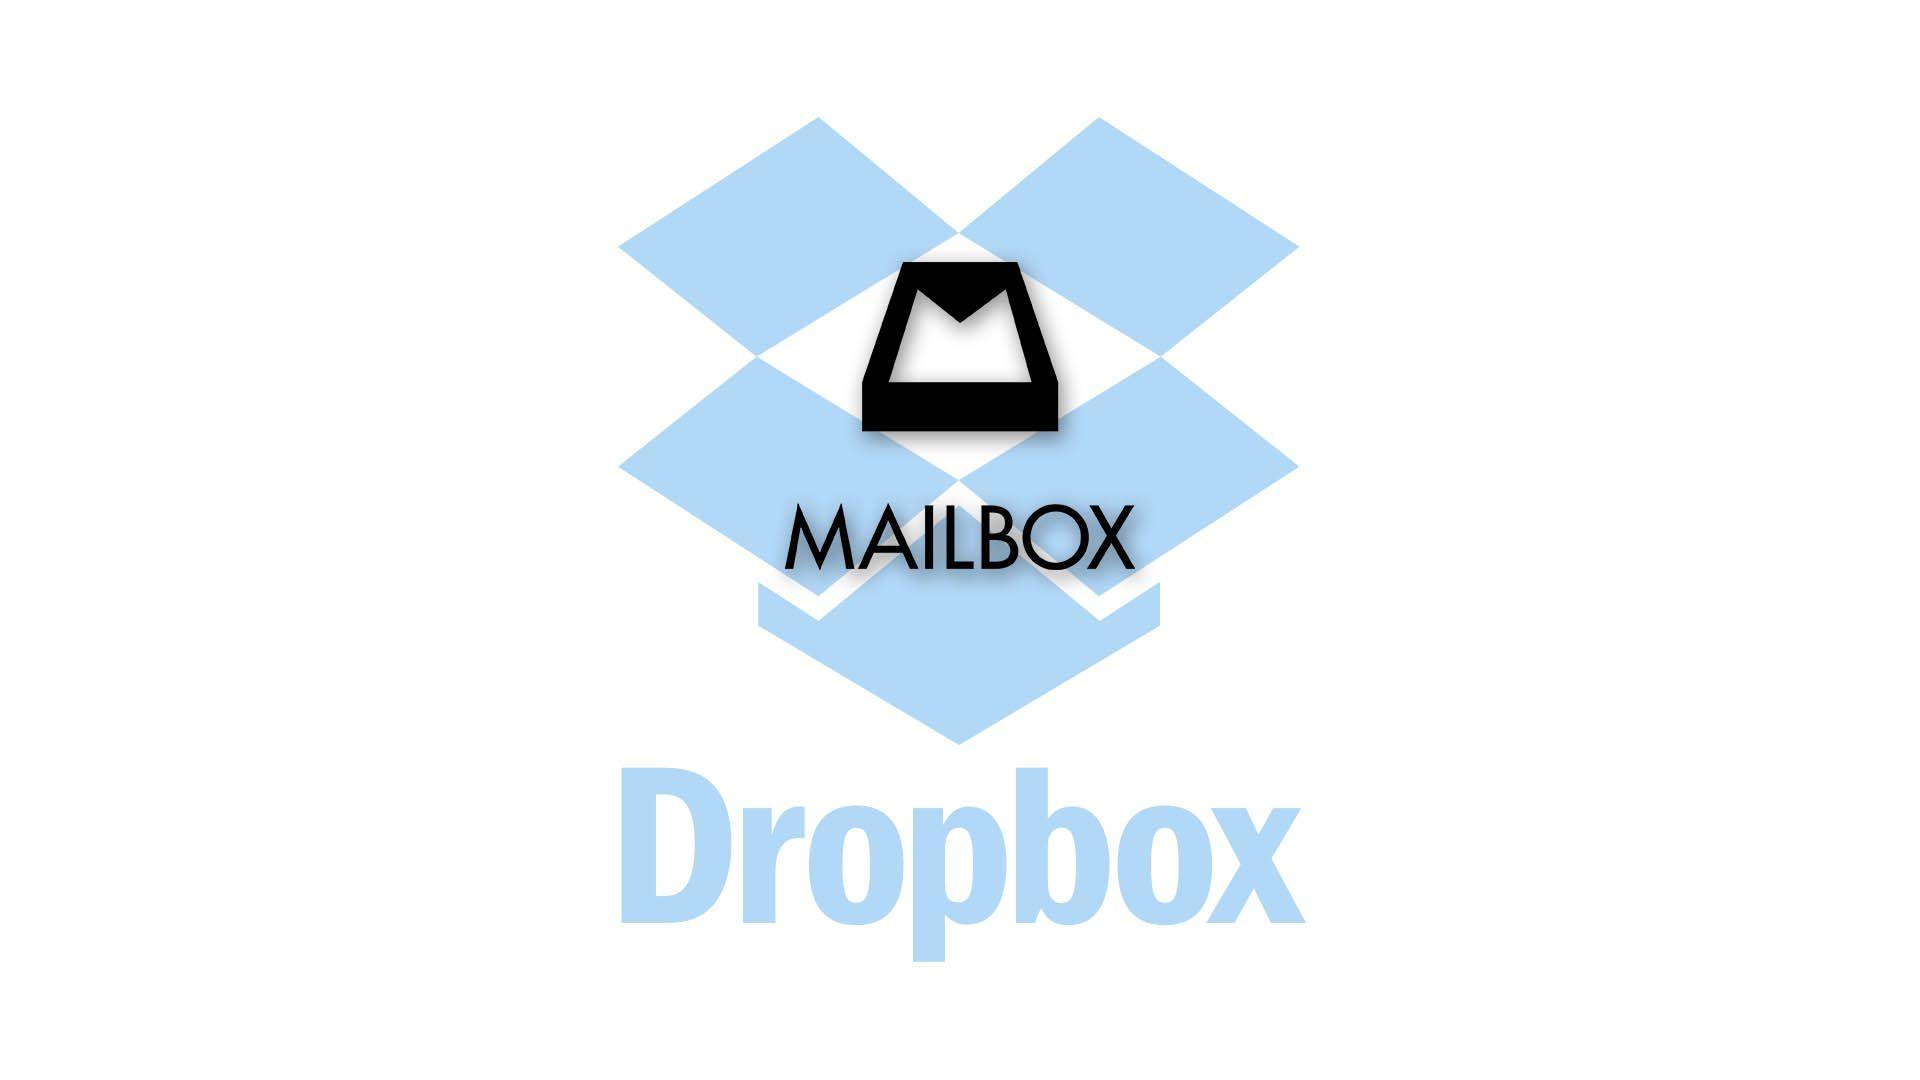 De 0 à 100 millions de dollars en 37 jours (Mailbox) #GrowthHacking #WEbMarketing #FormationGrowthHacking #CentreDeFormationFrance #TunnelAARRR #AARRR #SocialMedia #CommunityManagement #SEO